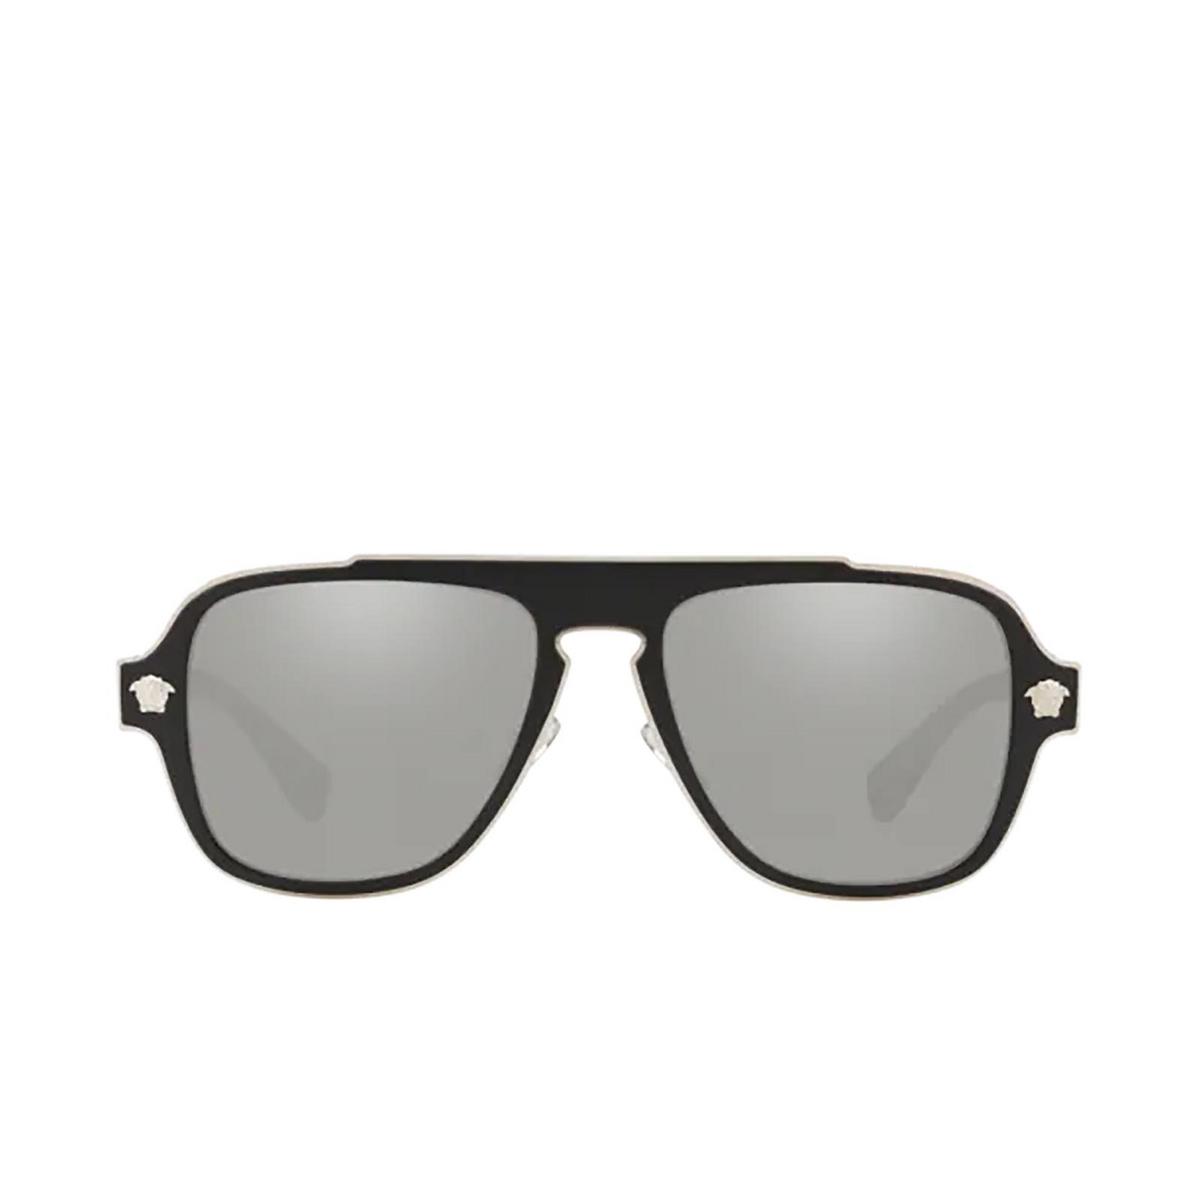 Versace® Aviator Sunglasses: Medusa Charm VE2199 color Matte Black 10006G.